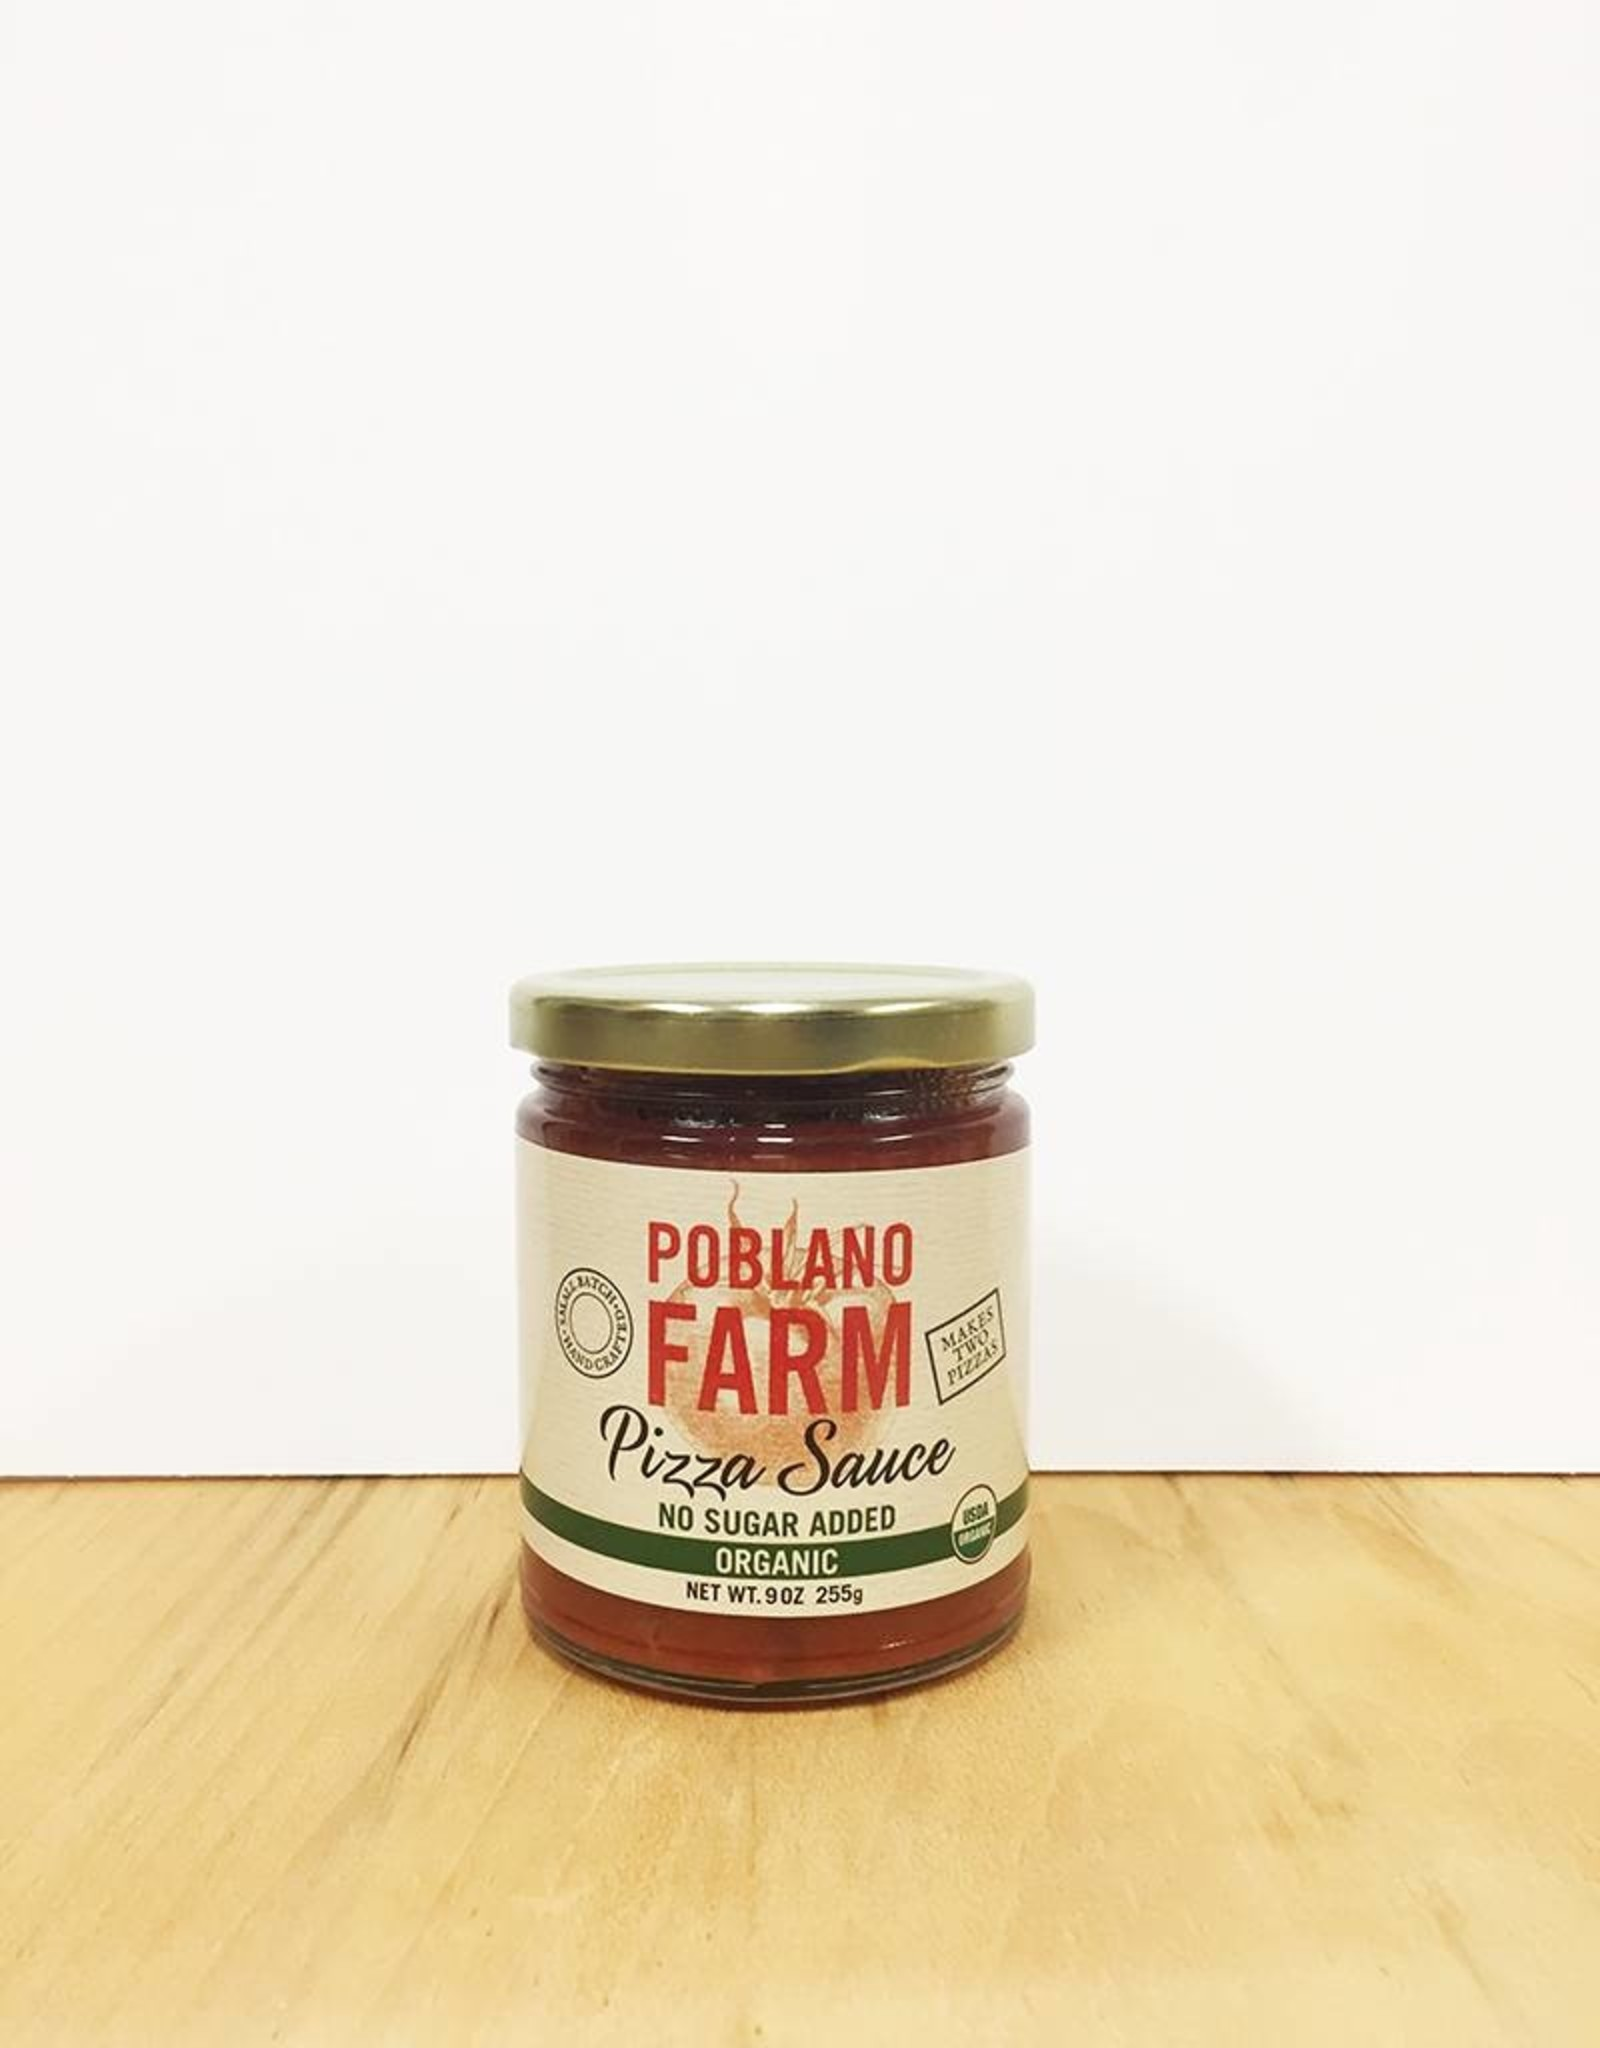 Poblano Farm Poblano Farm Pizza Sauce 12oz